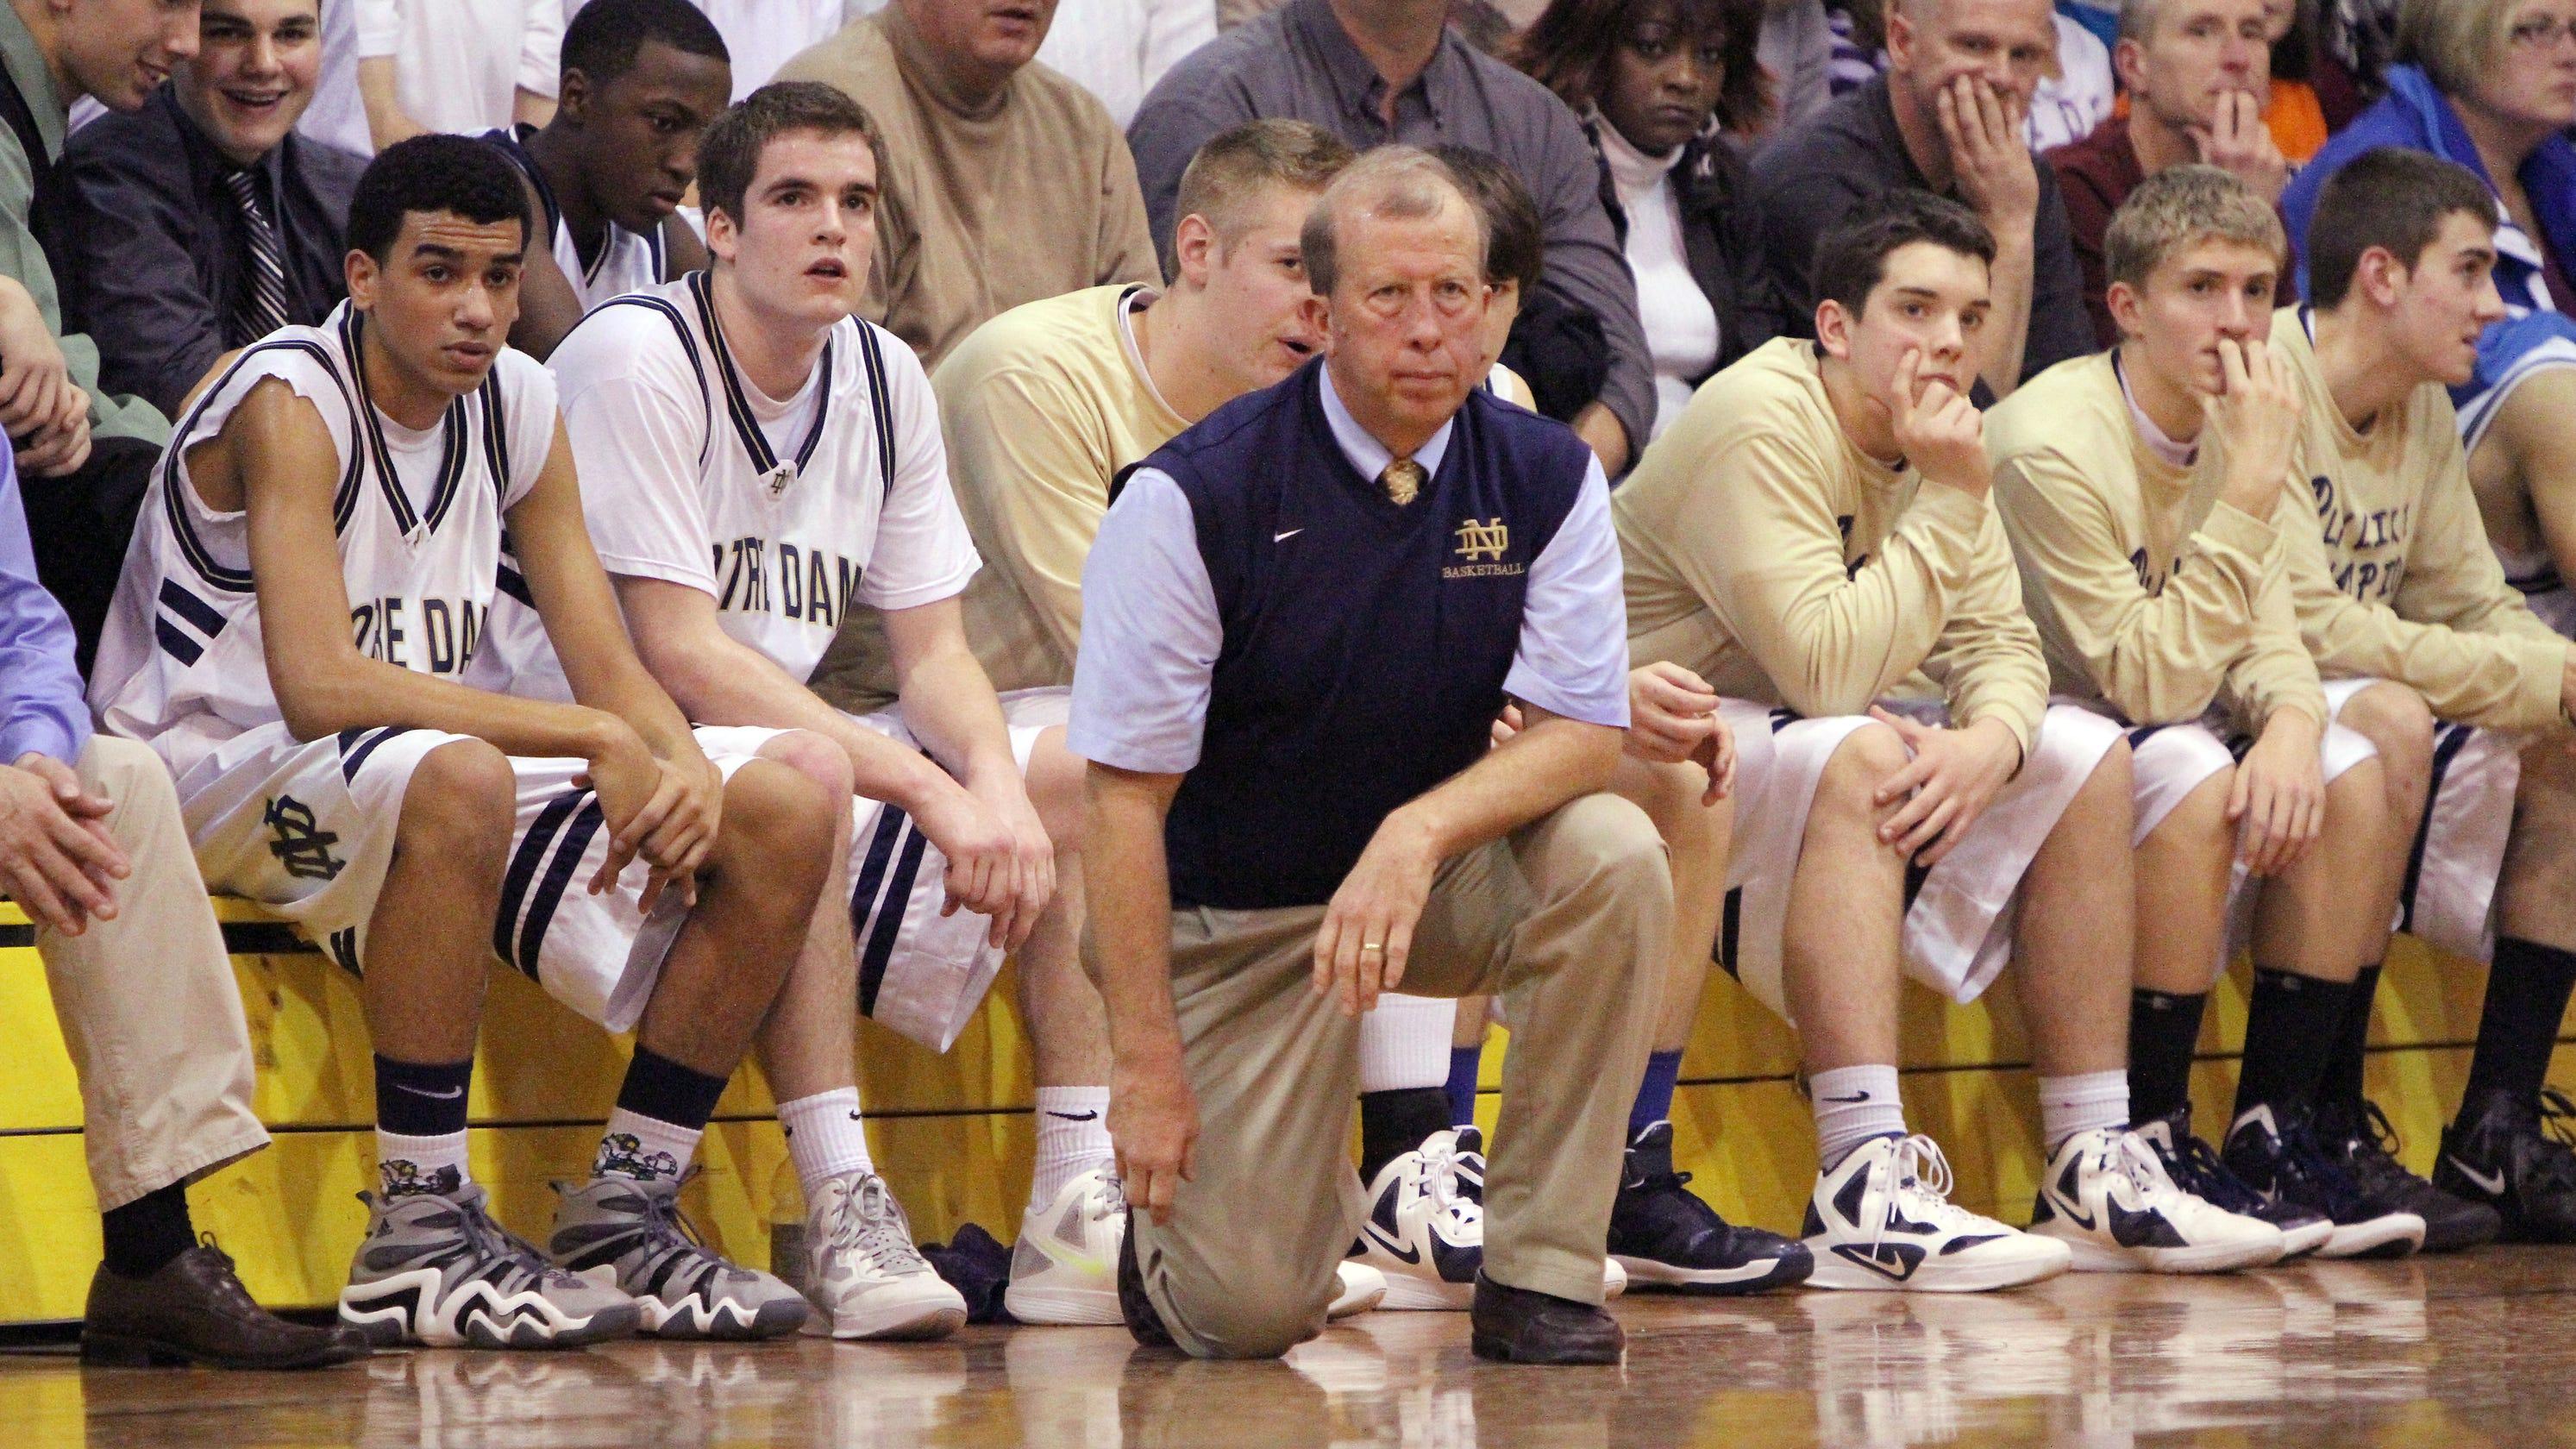 Bill Hopkins retires after 45 seasons as a basketball coach